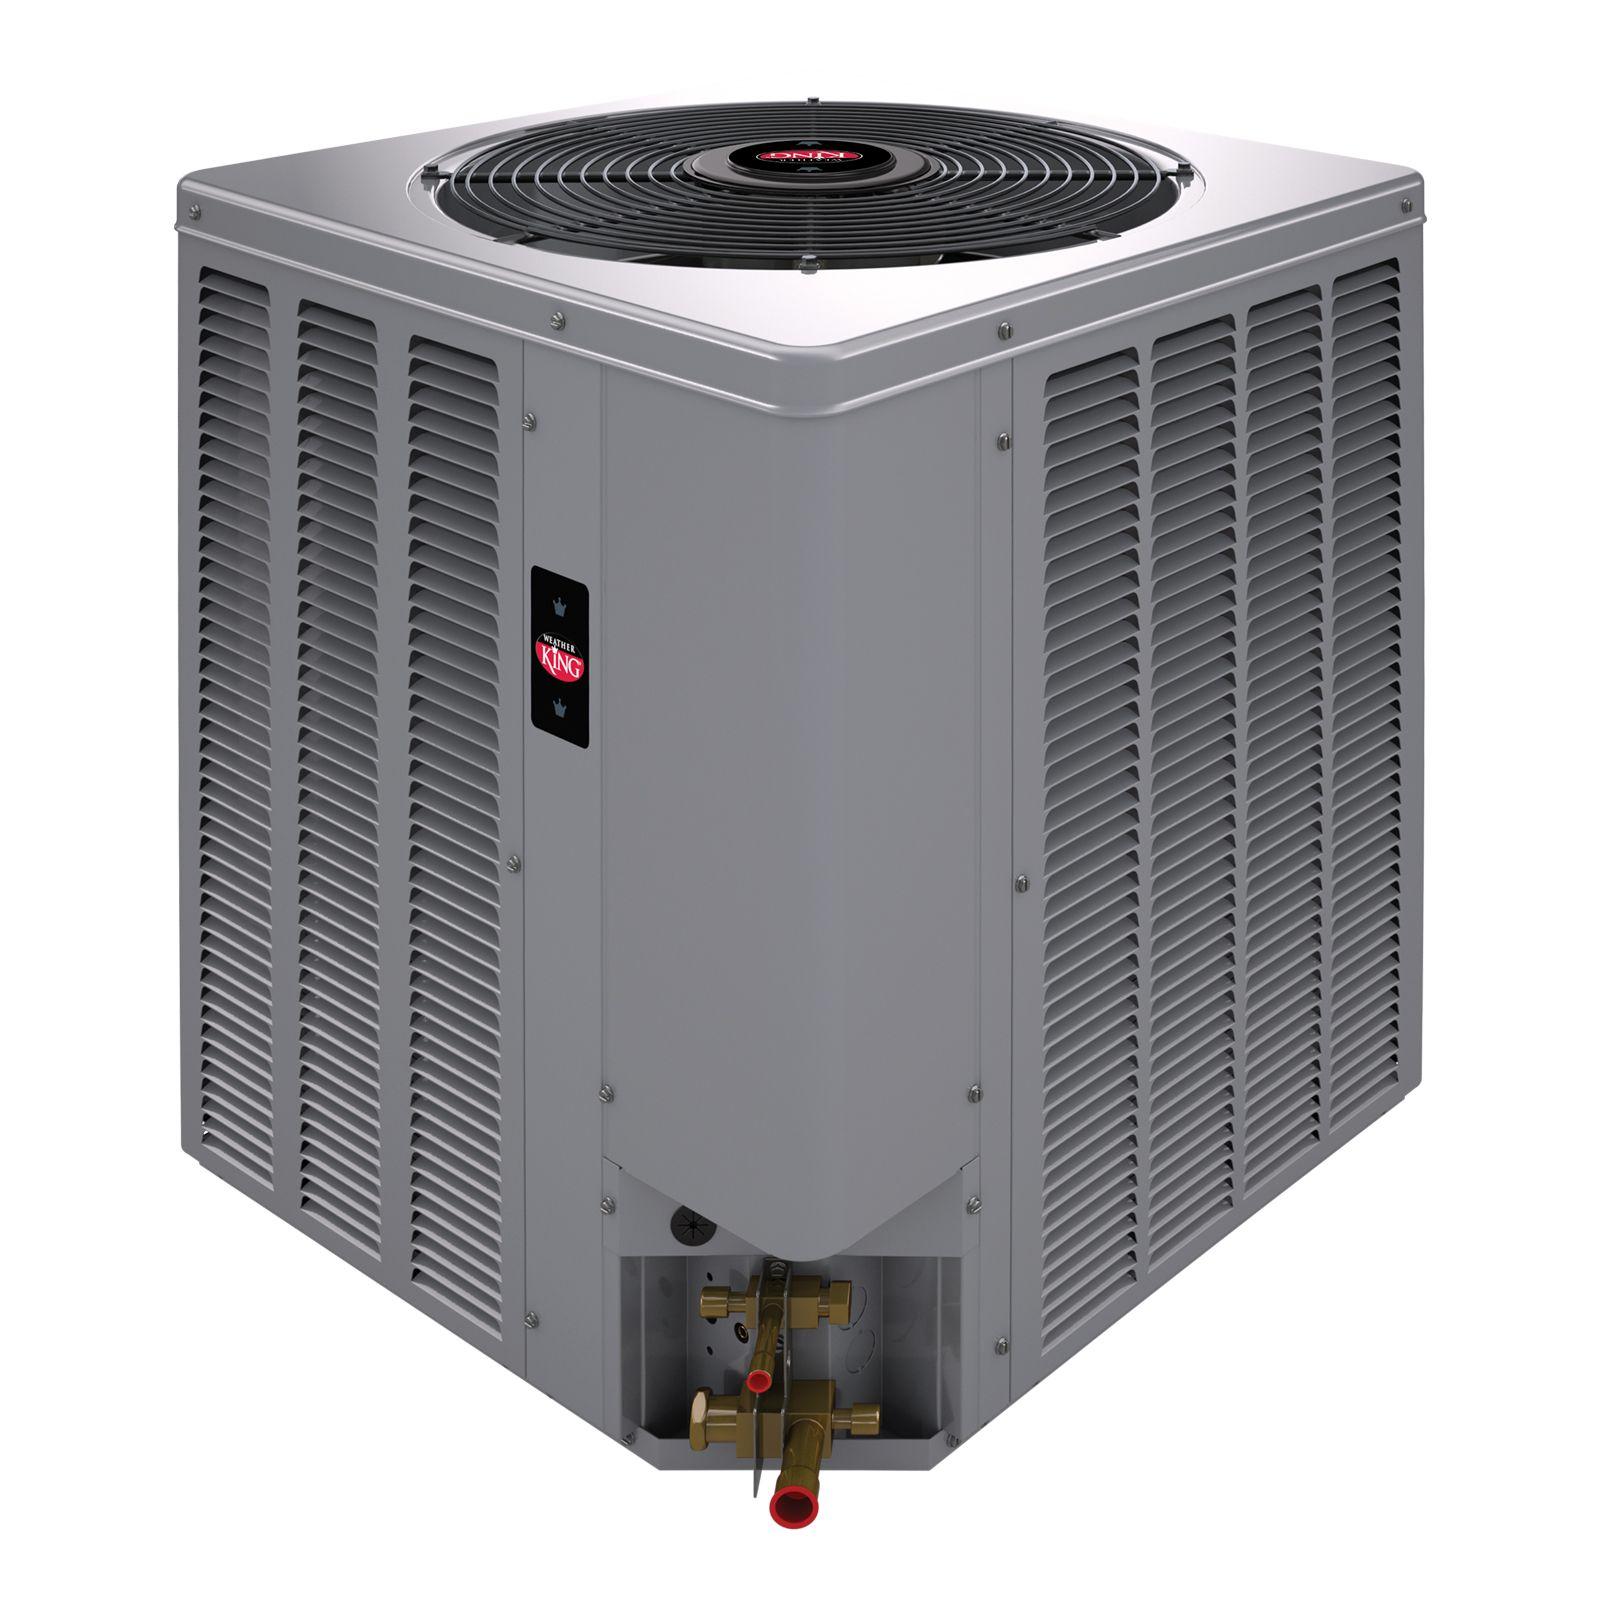 Weatherking Air Conditioner Wiring Diagram on